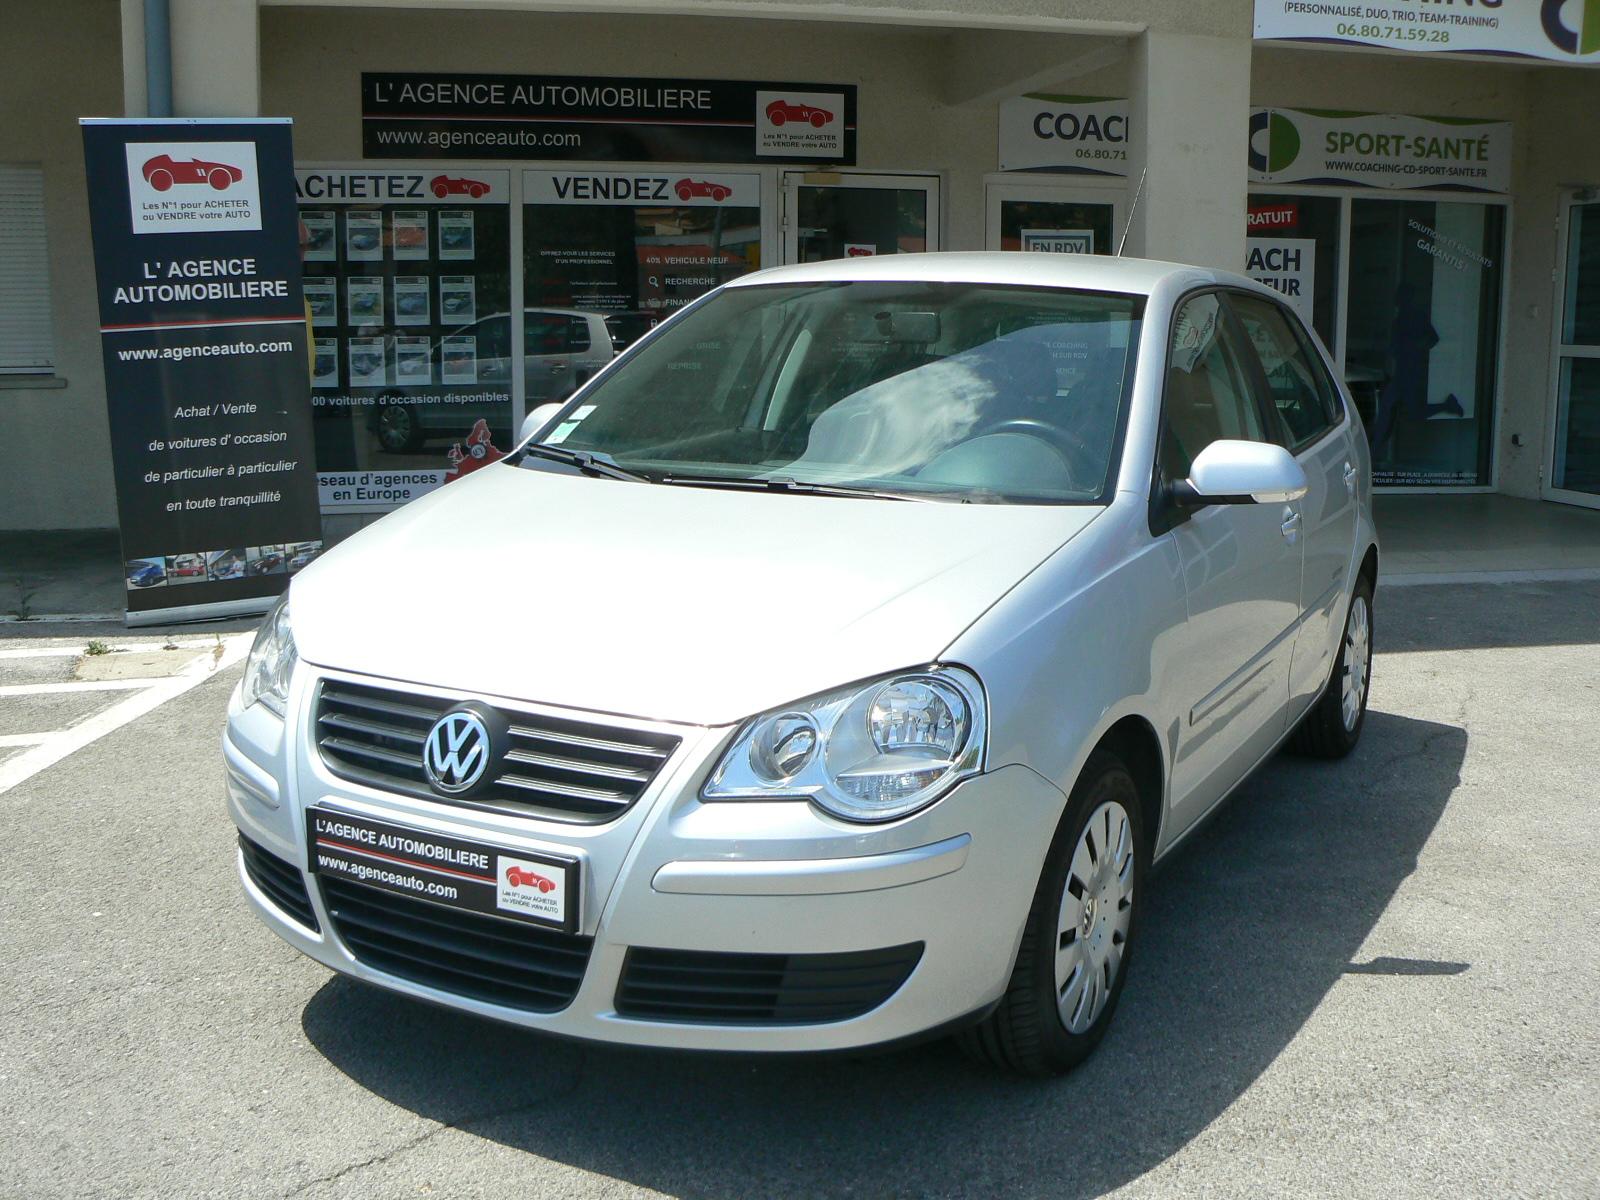 Volkswagen Polo 1.4 TDI 70ch United 5p occasion Montpellier pas cher ... 41f98e06d74